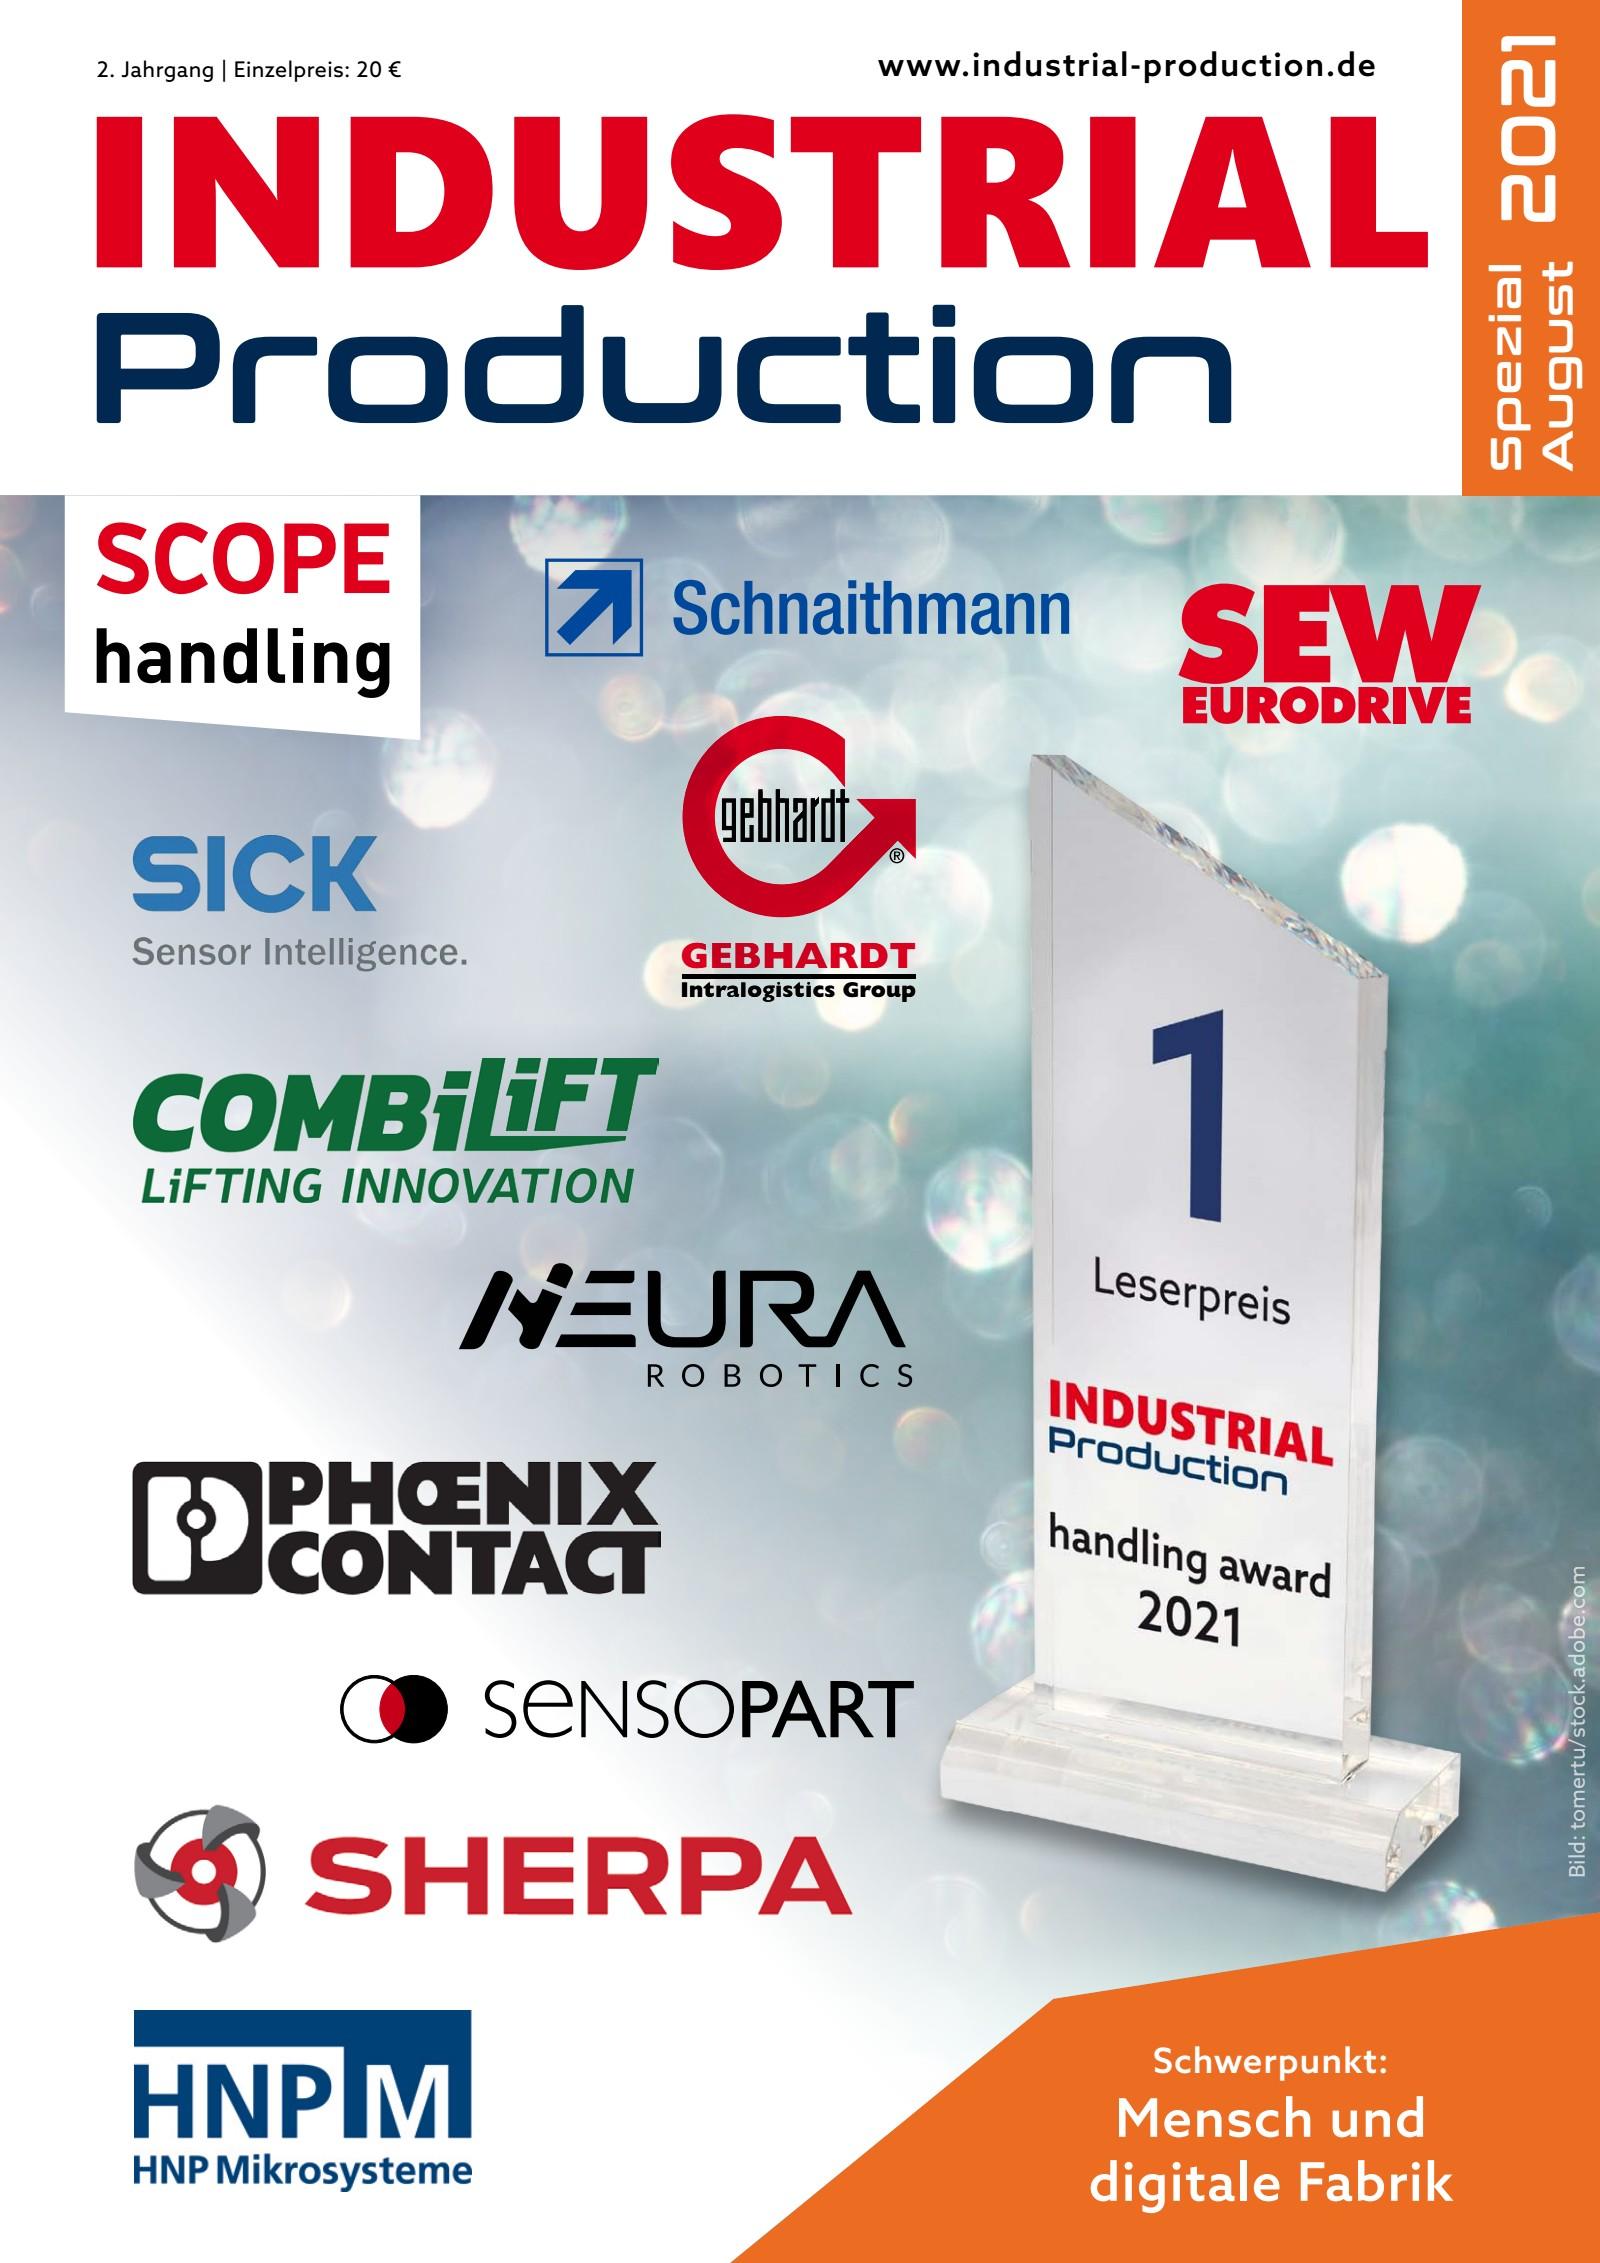 INDUSTRIAL Production Spezial / August 2021 Digital